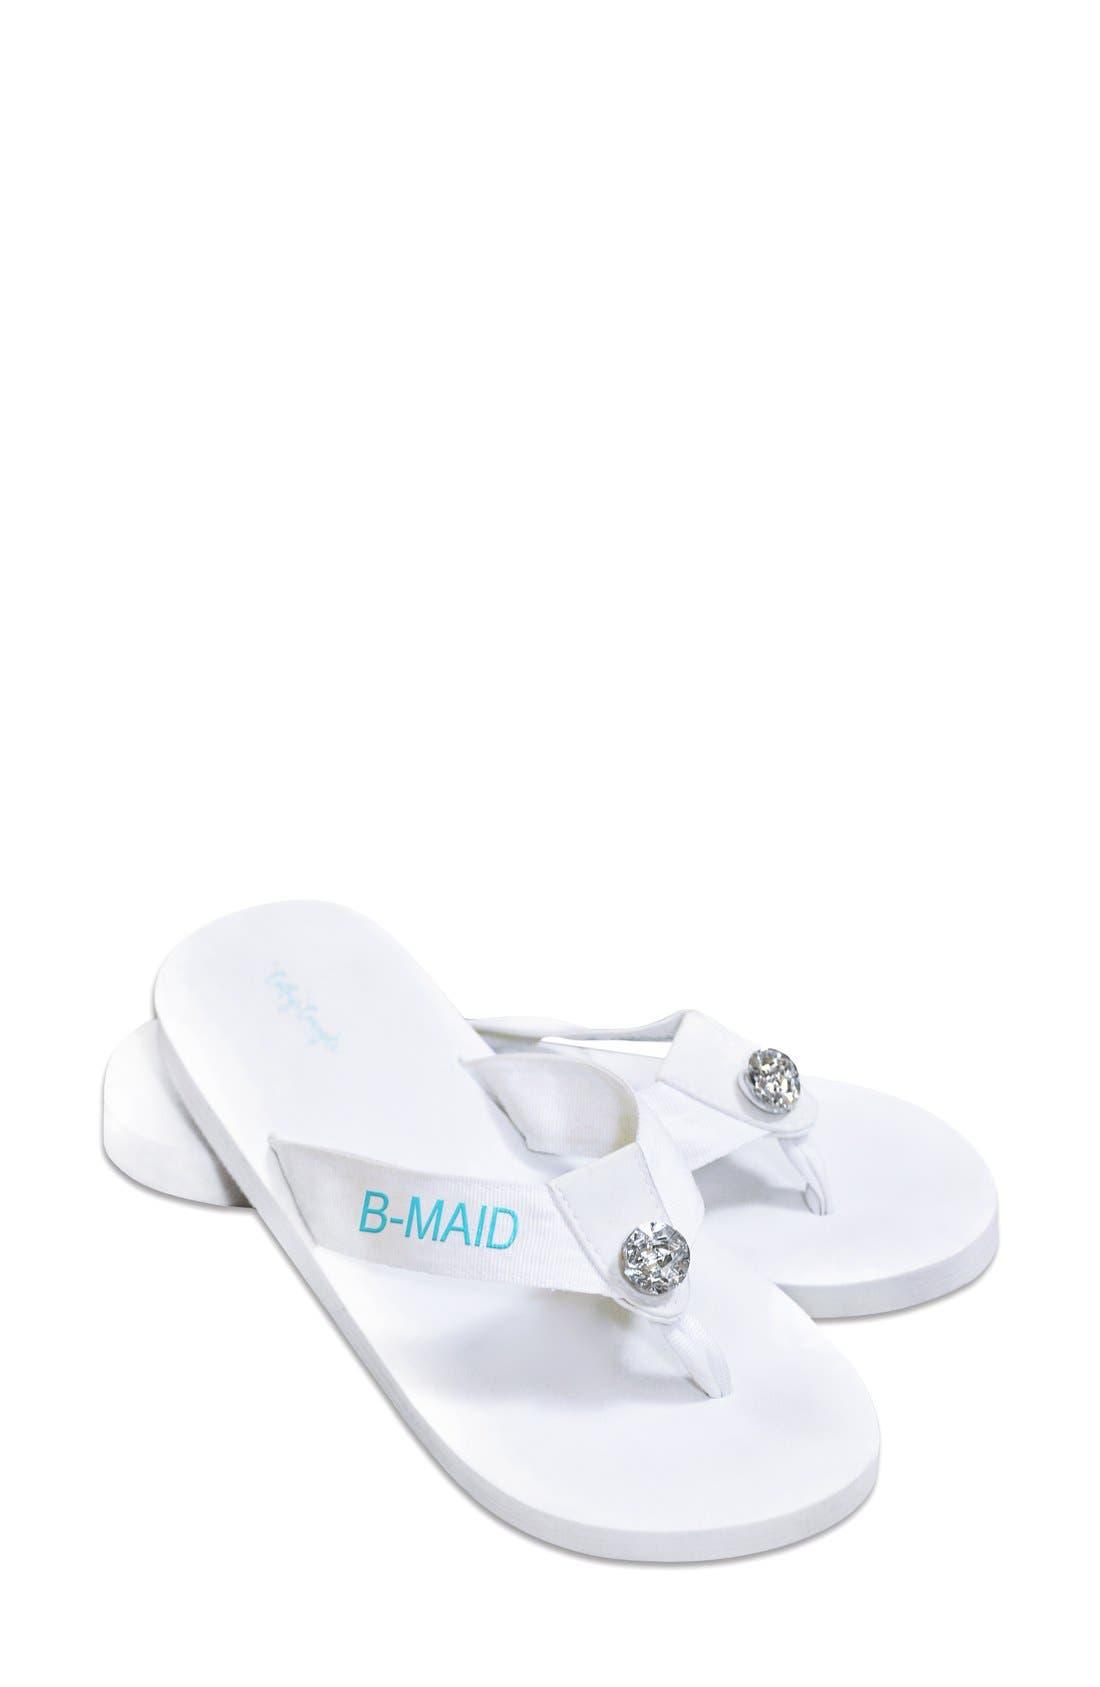 'Bridesmaid' Personalized Flip Flops,                             Main thumbnail 1, color,                             100